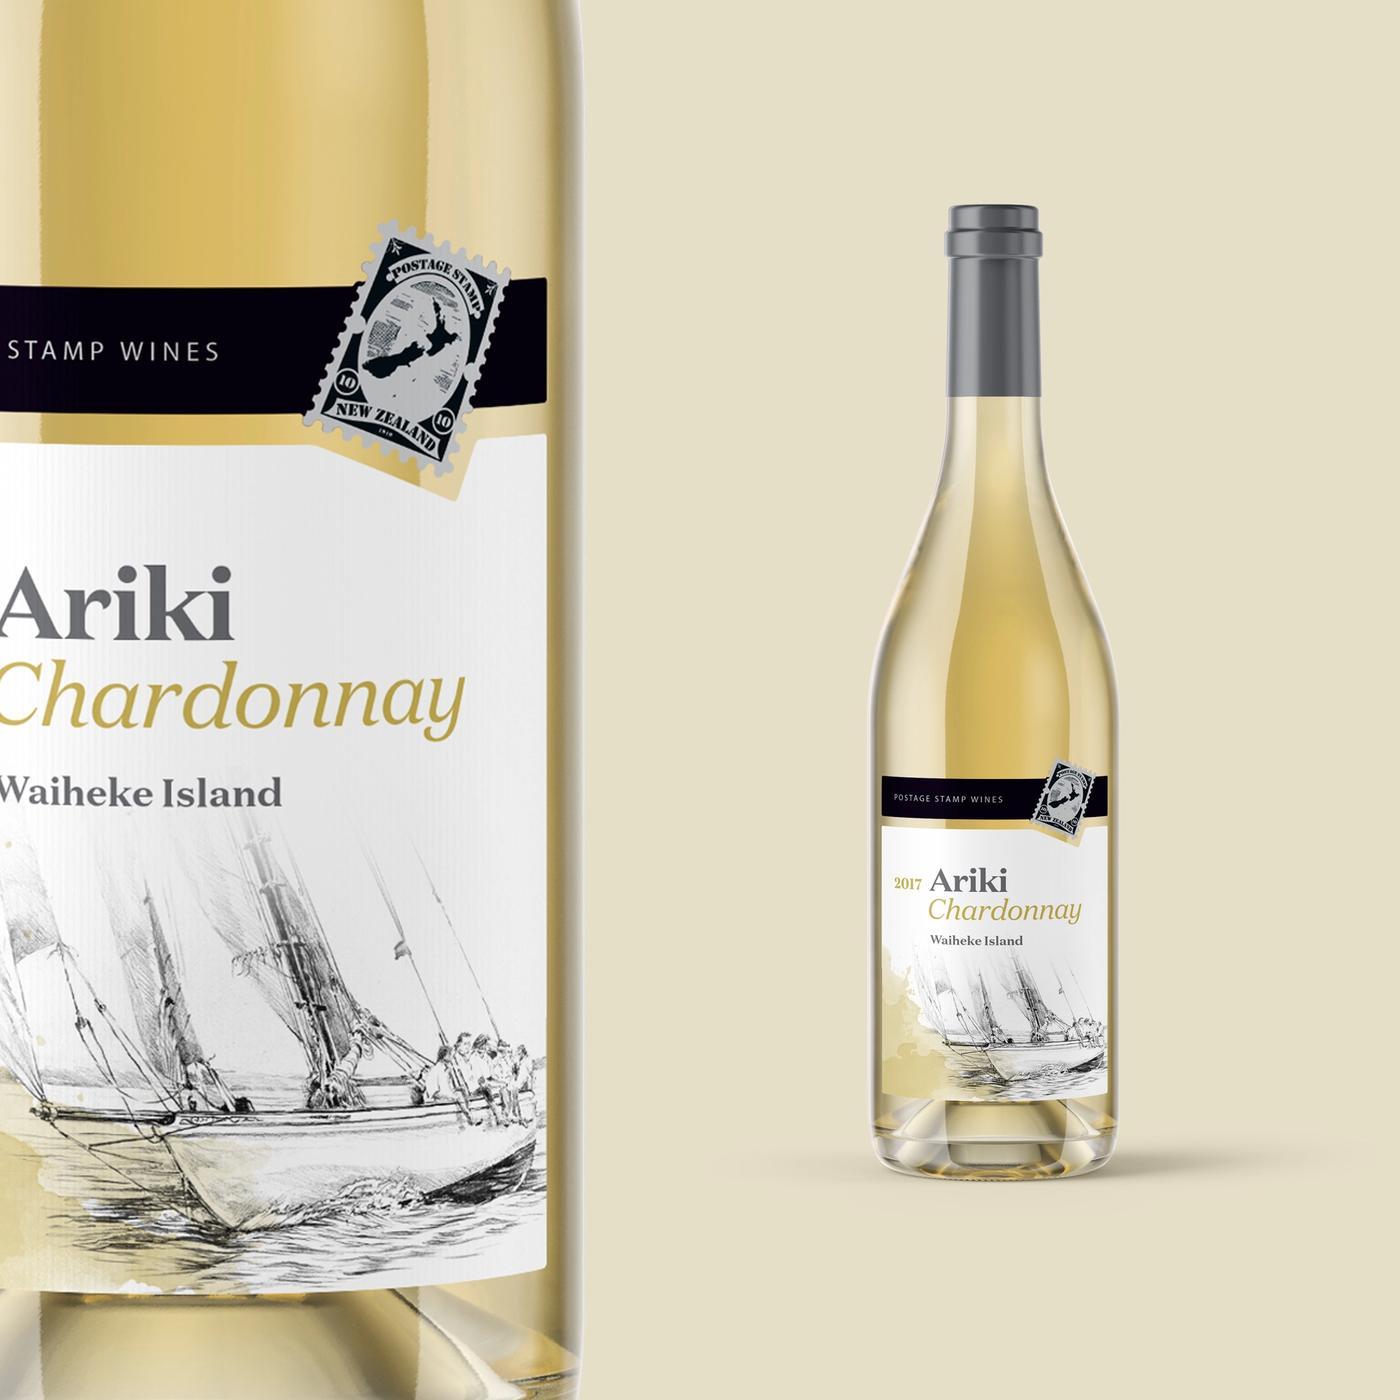 Postage stamp wines chardonnay